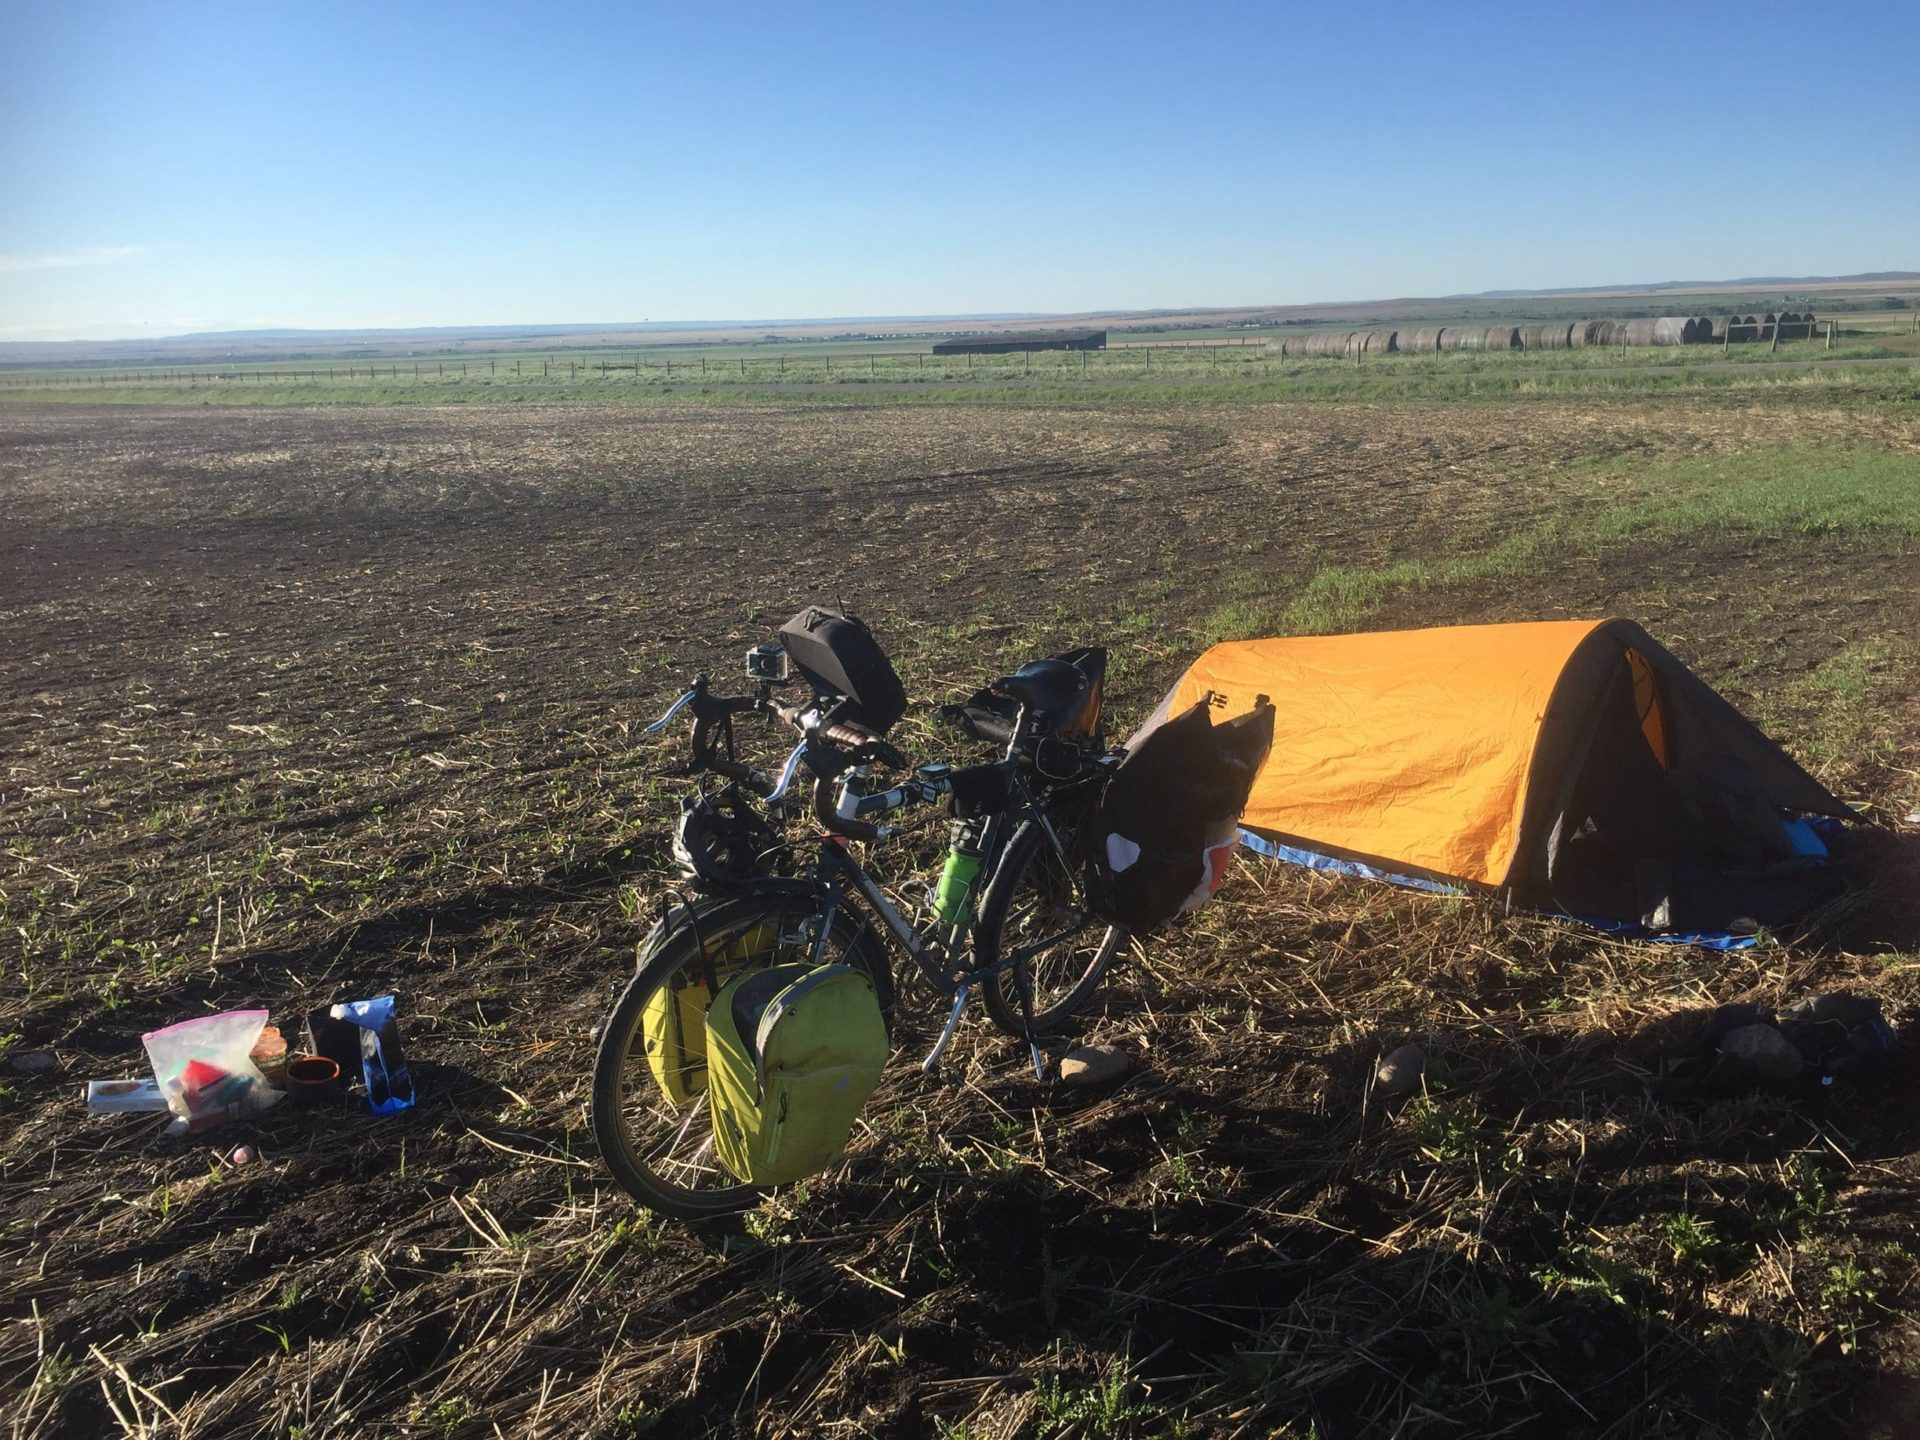 Camp setup in a friendly Saskatchewan farmer's field.